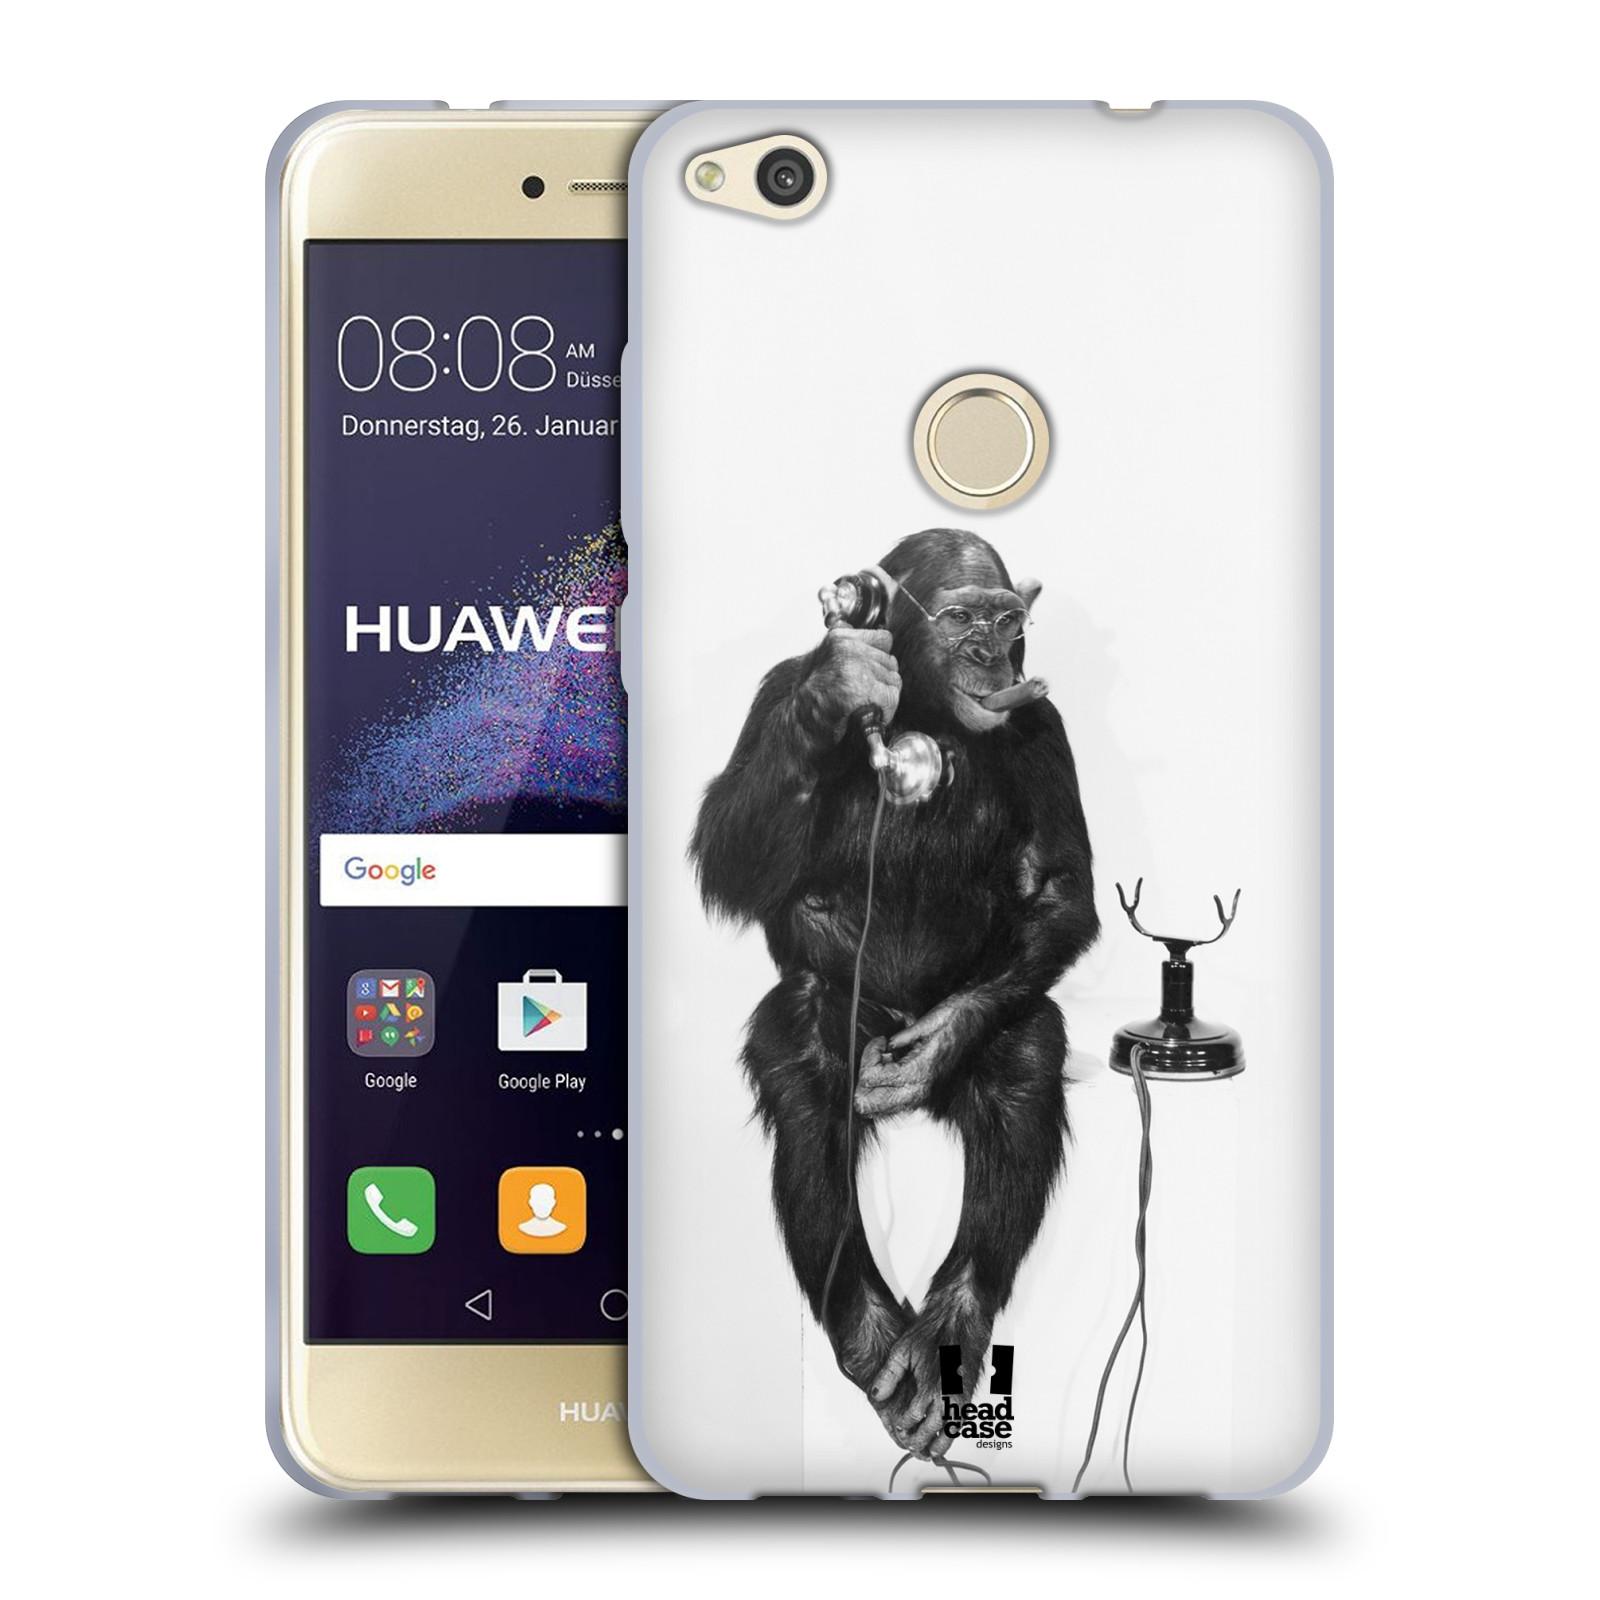 Silikonové pouzdro na mobil Honor 8 Lite - Head Case - OPIČÁK S TELEFONEM (Silikonový kryt či obal na mobilní telefon Honor 8 Lite s motivem OPIČÁK S TELEFONEM)